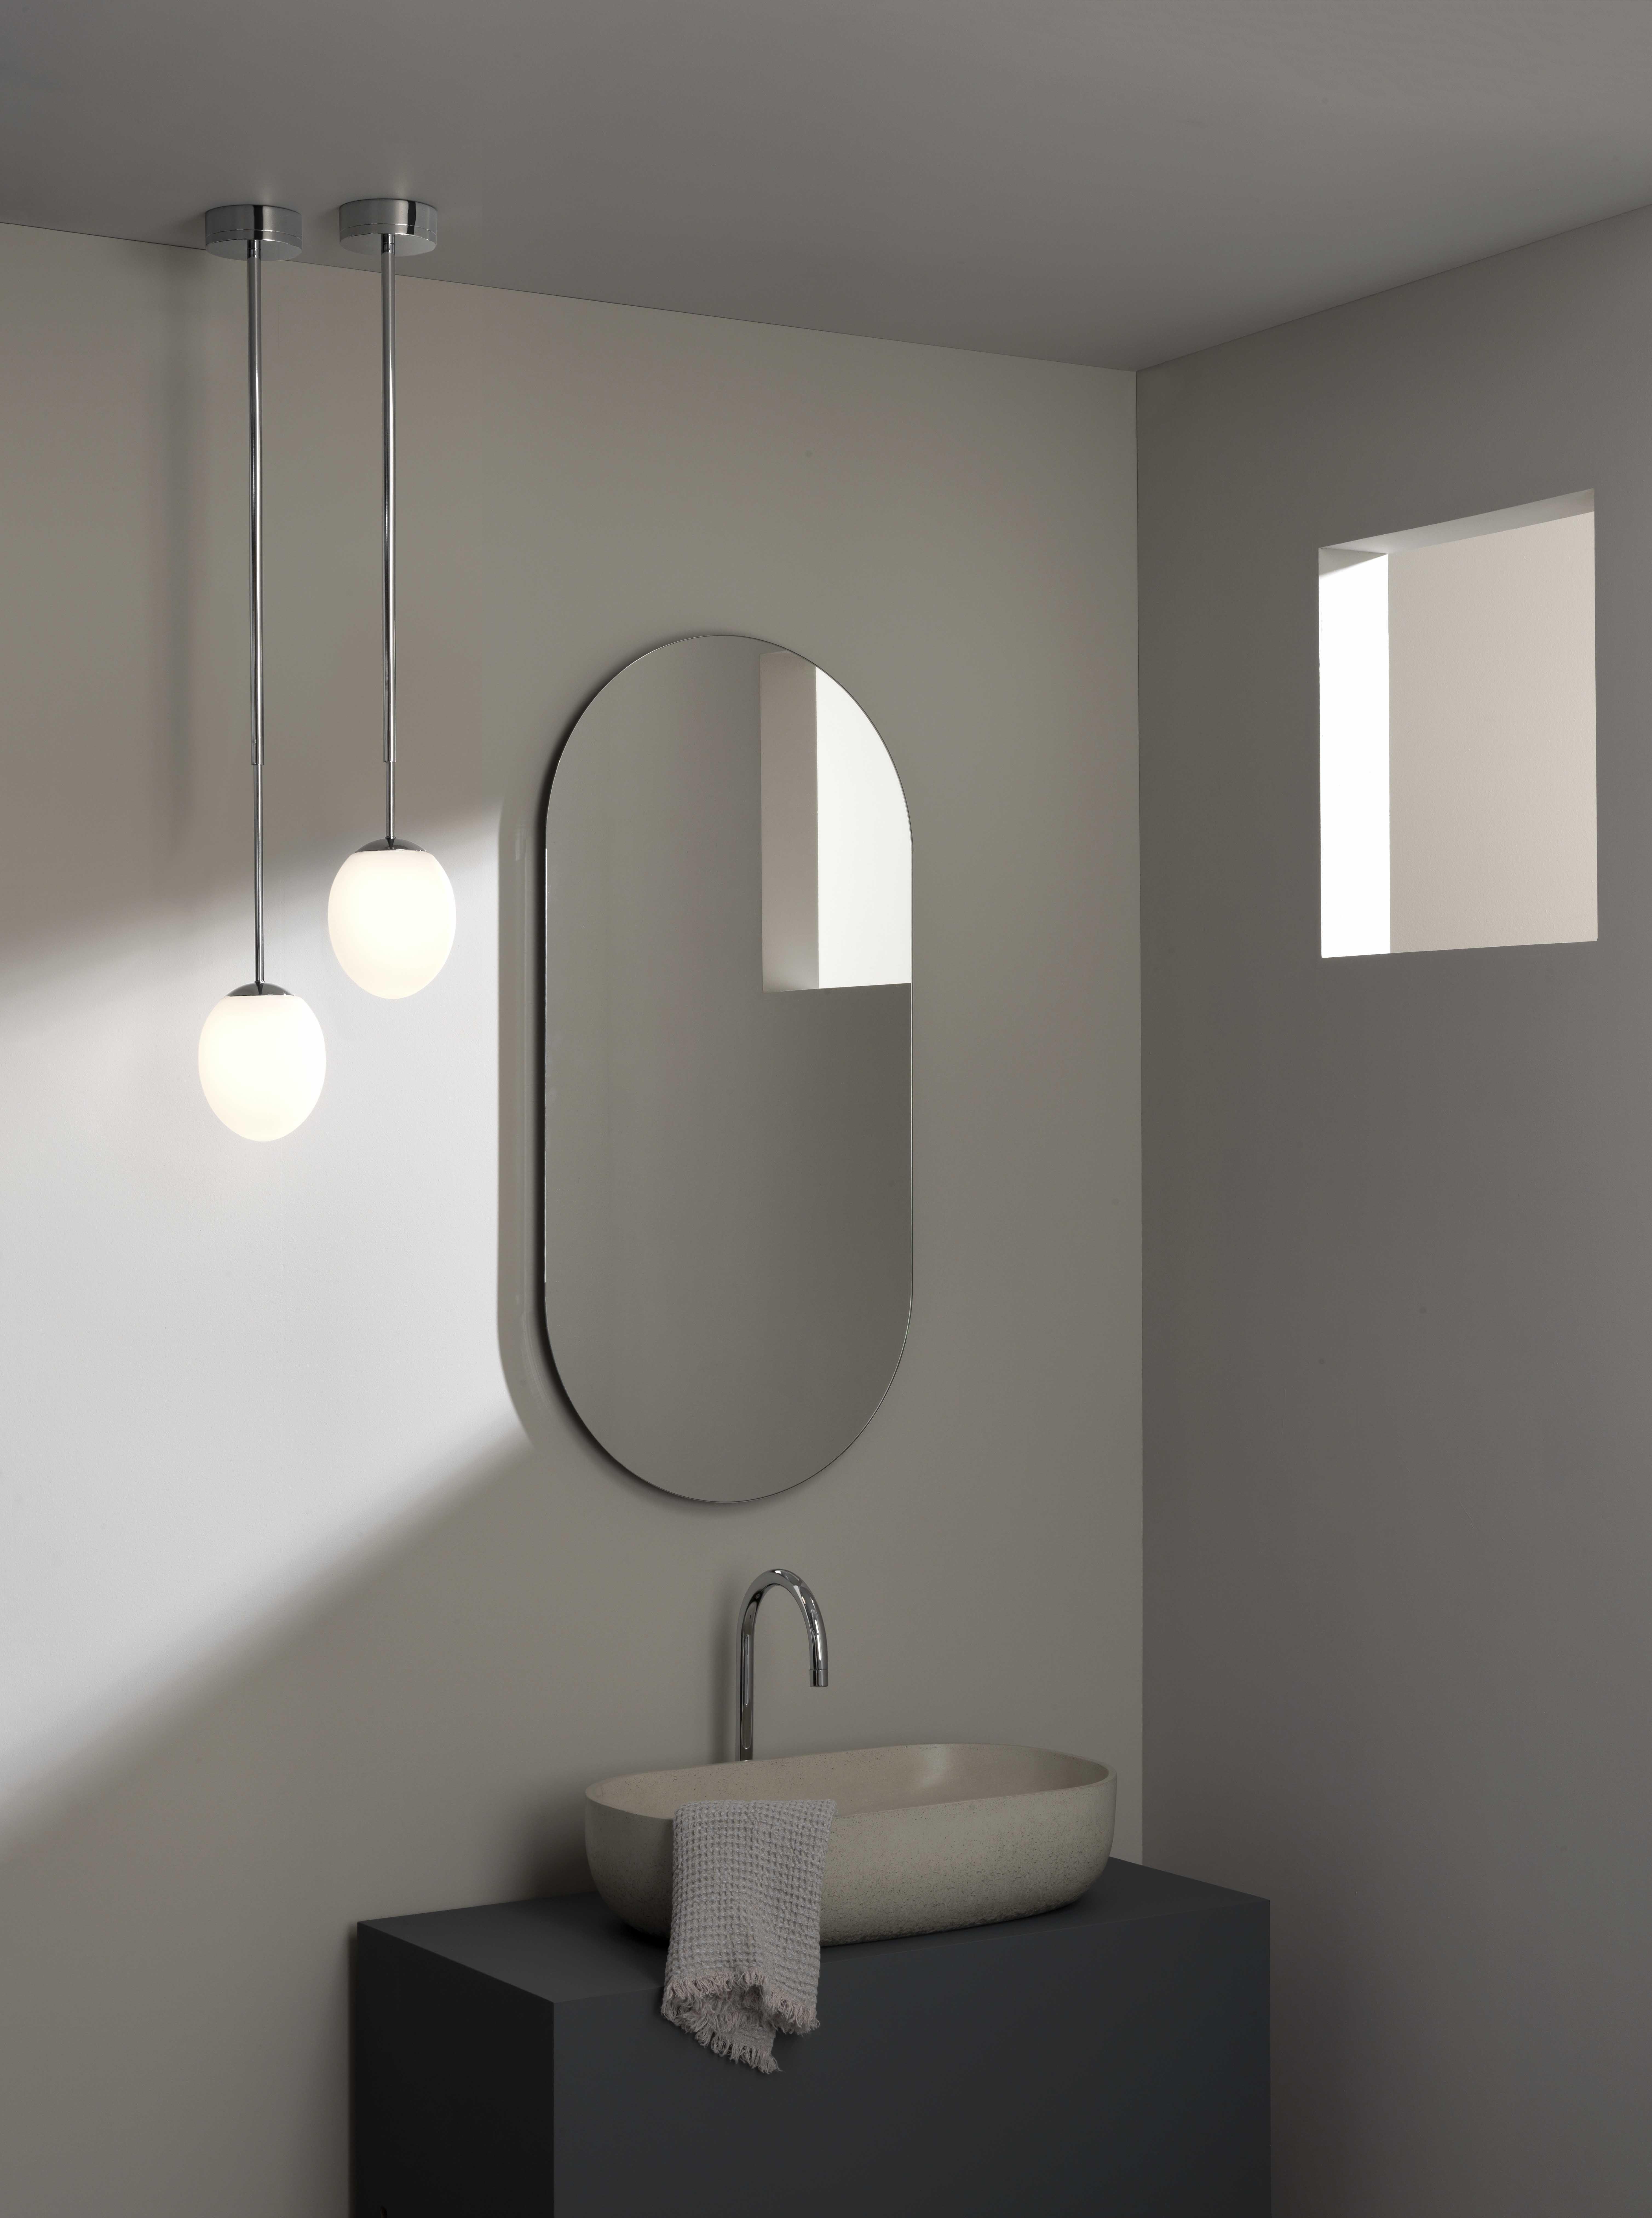 The Hanging Led Kiwi Pendant Light By Astro Lighting Bathroom Pendant Bathroom Pendant Lighting Bathroom Ceiling Pendant